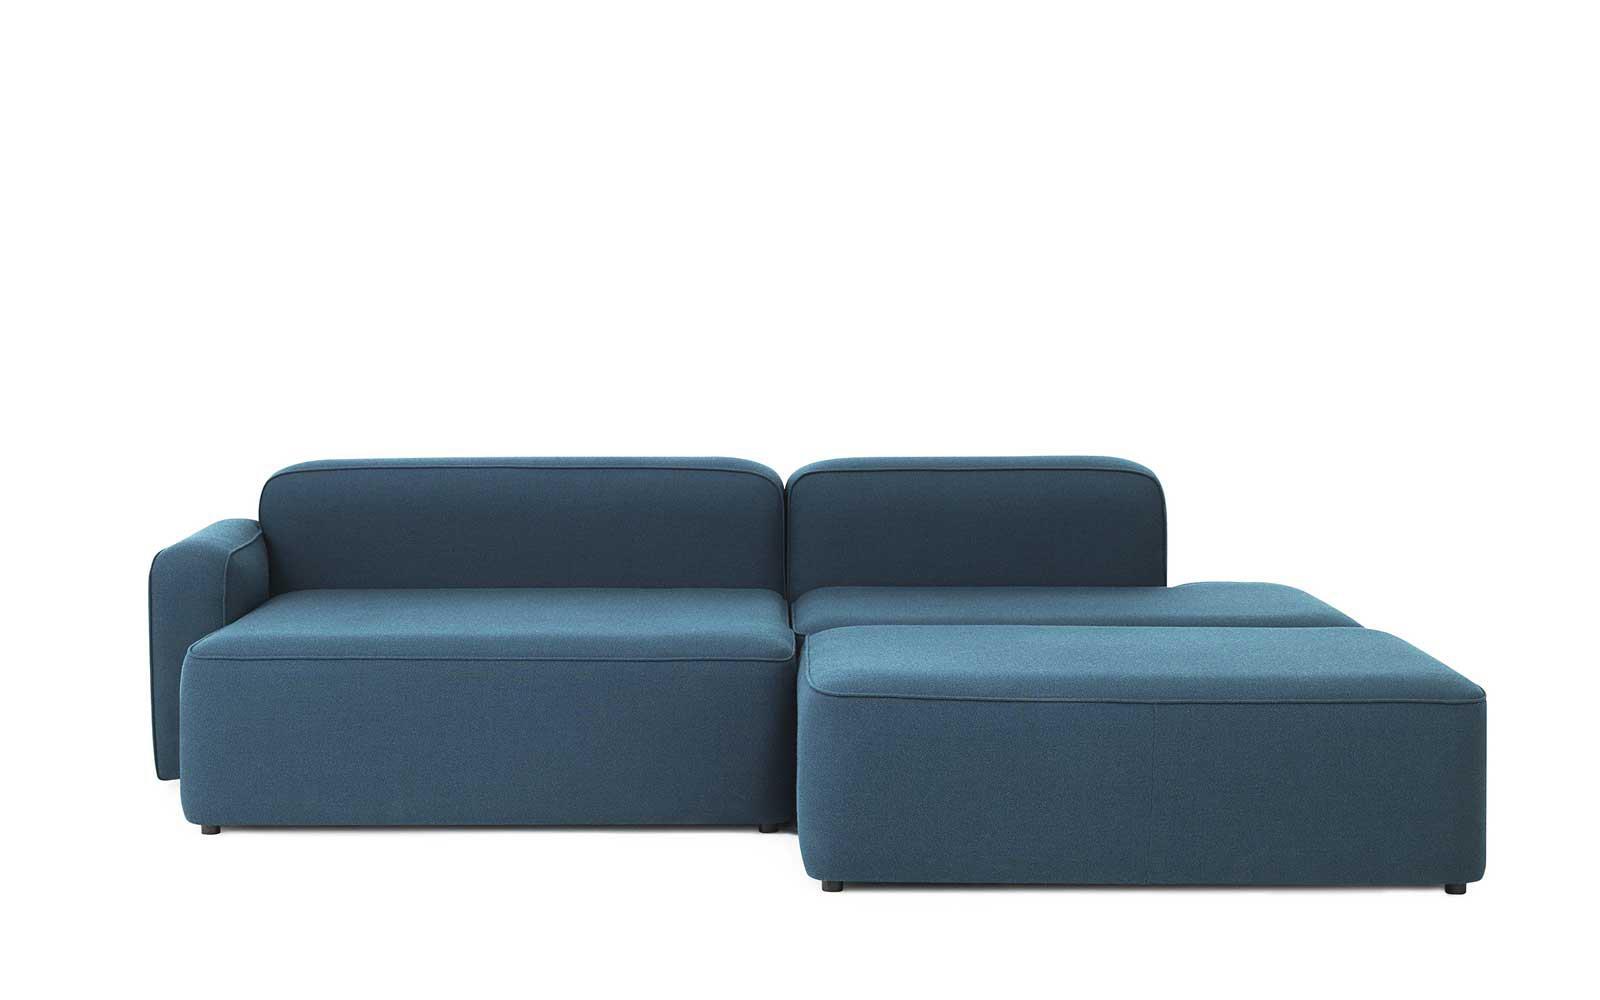 meilleur service 7ba19 99c96 Rope Sofa Chaise Longue left with Pouf Fame Hybrid